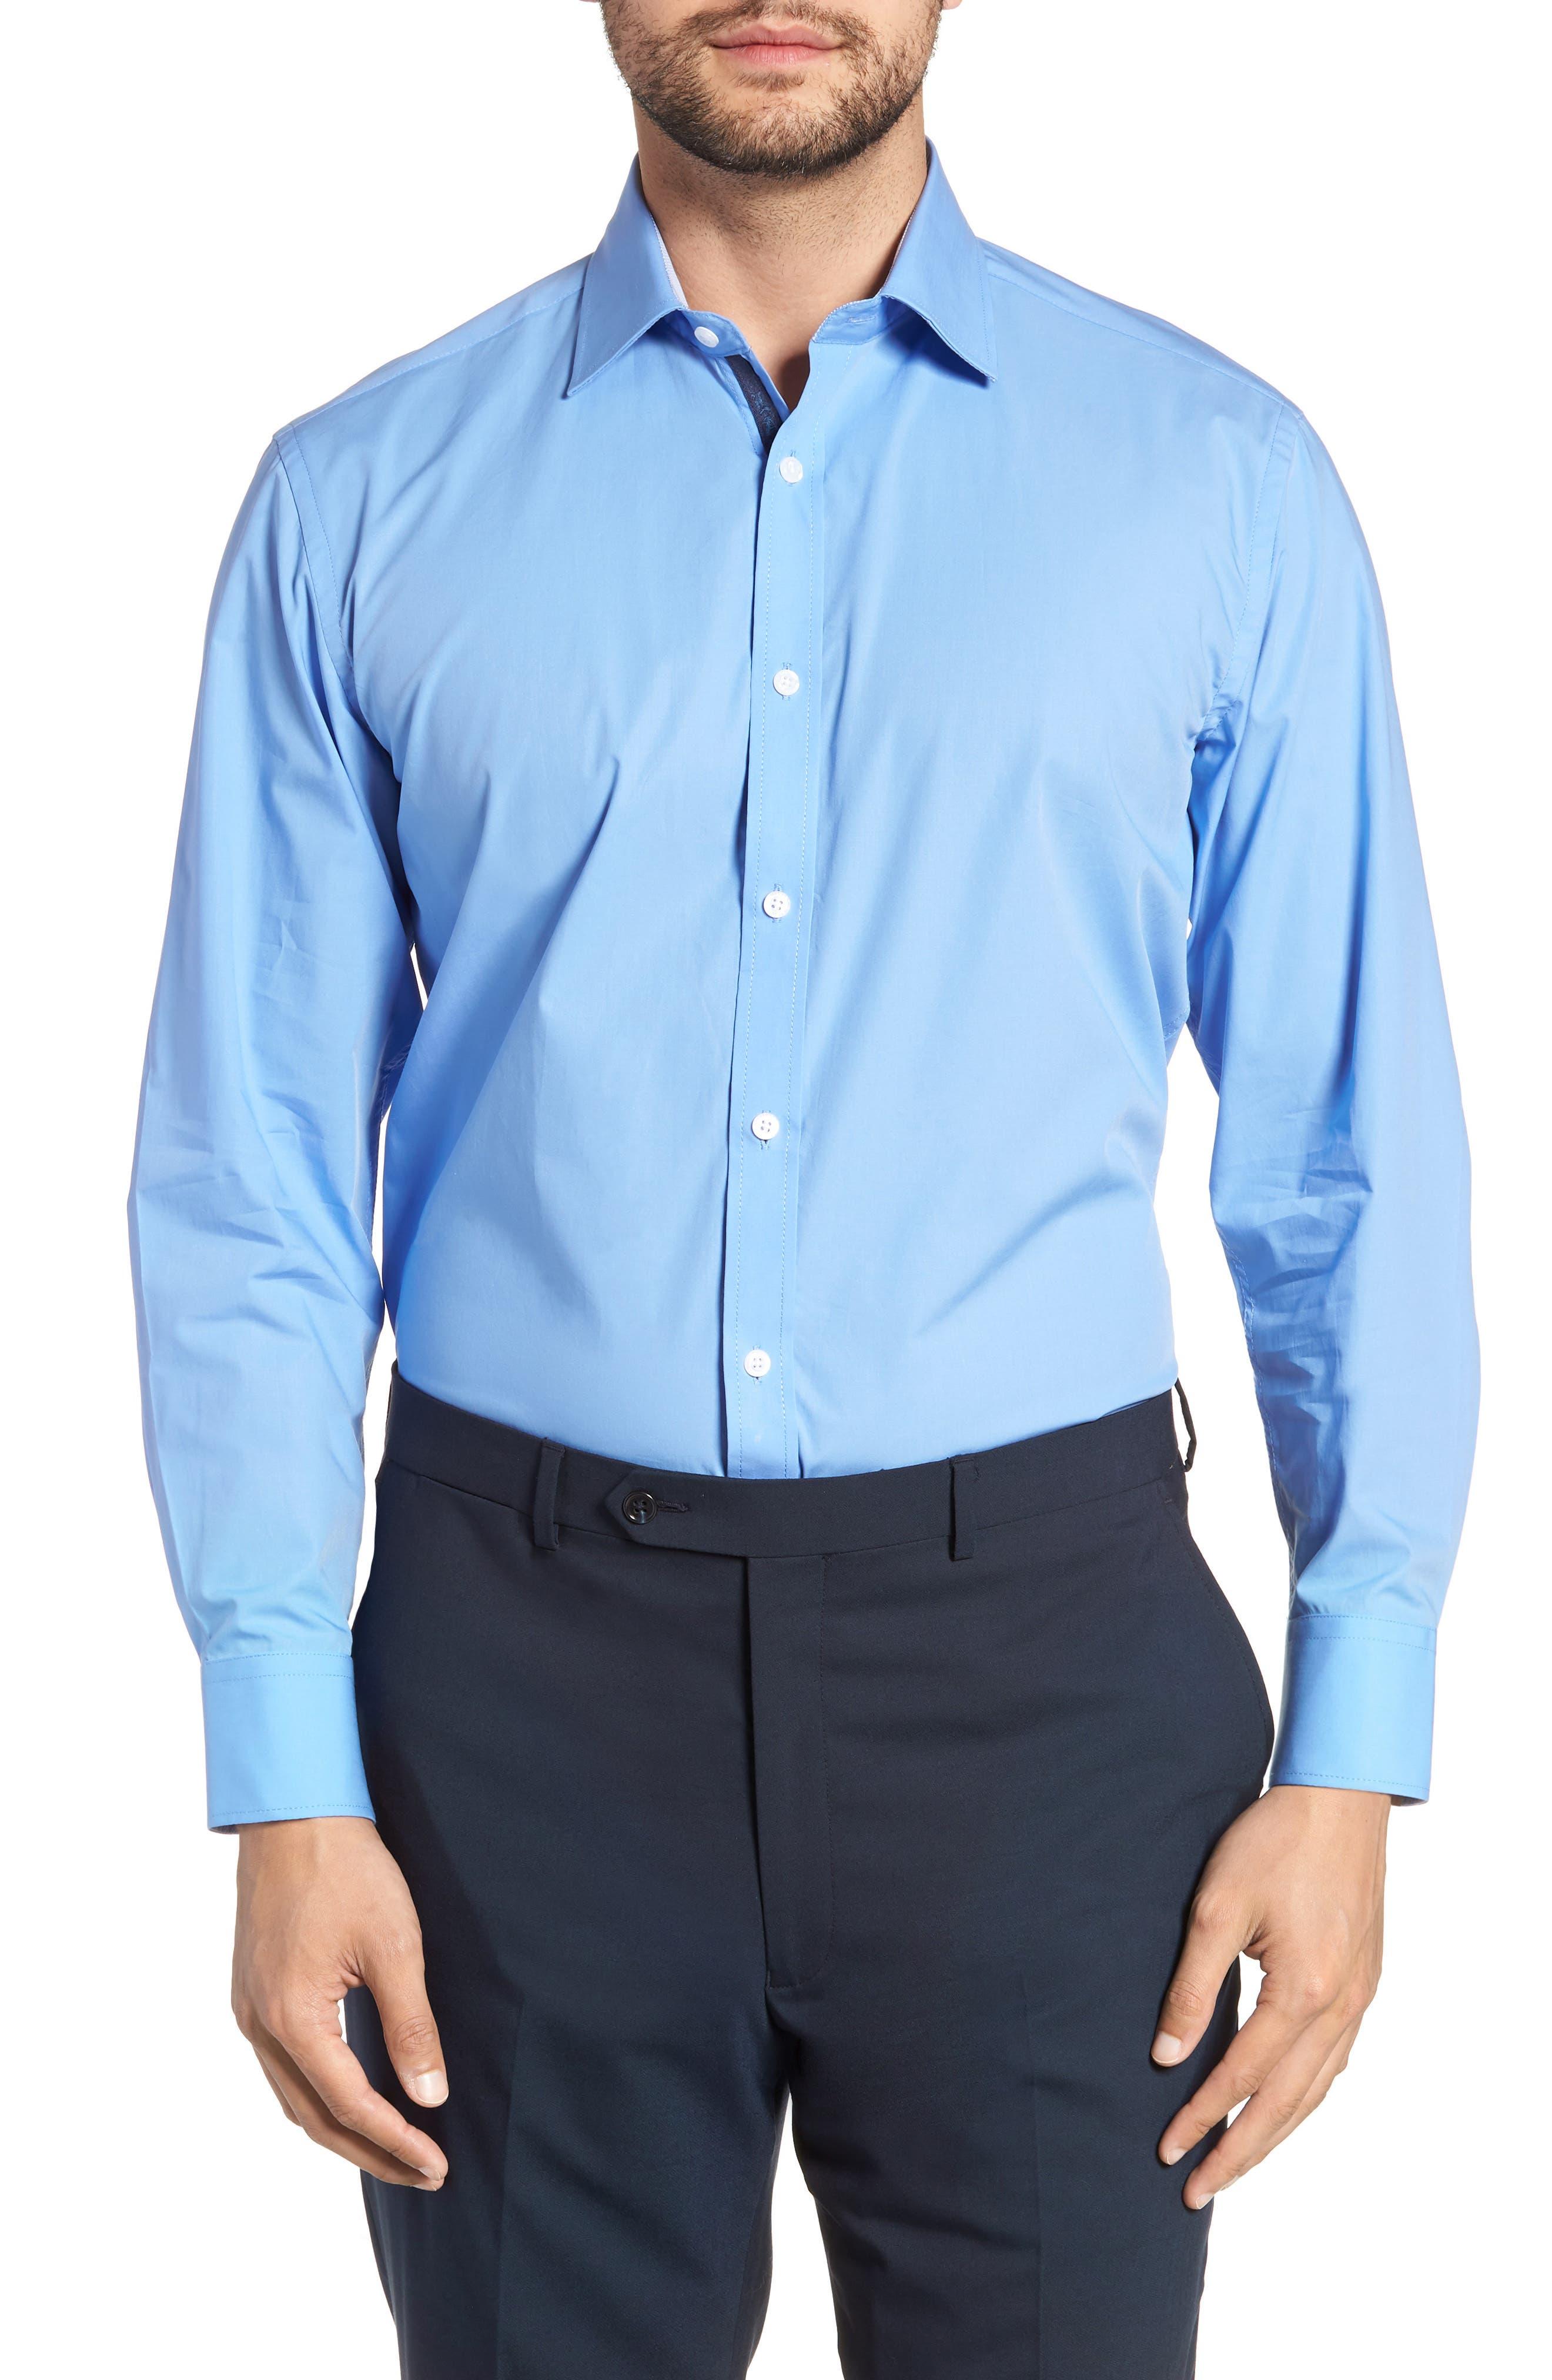 ENGLISH LAUNDRY REGULAR FIT STRETCH SOLID DRESS SHIRT